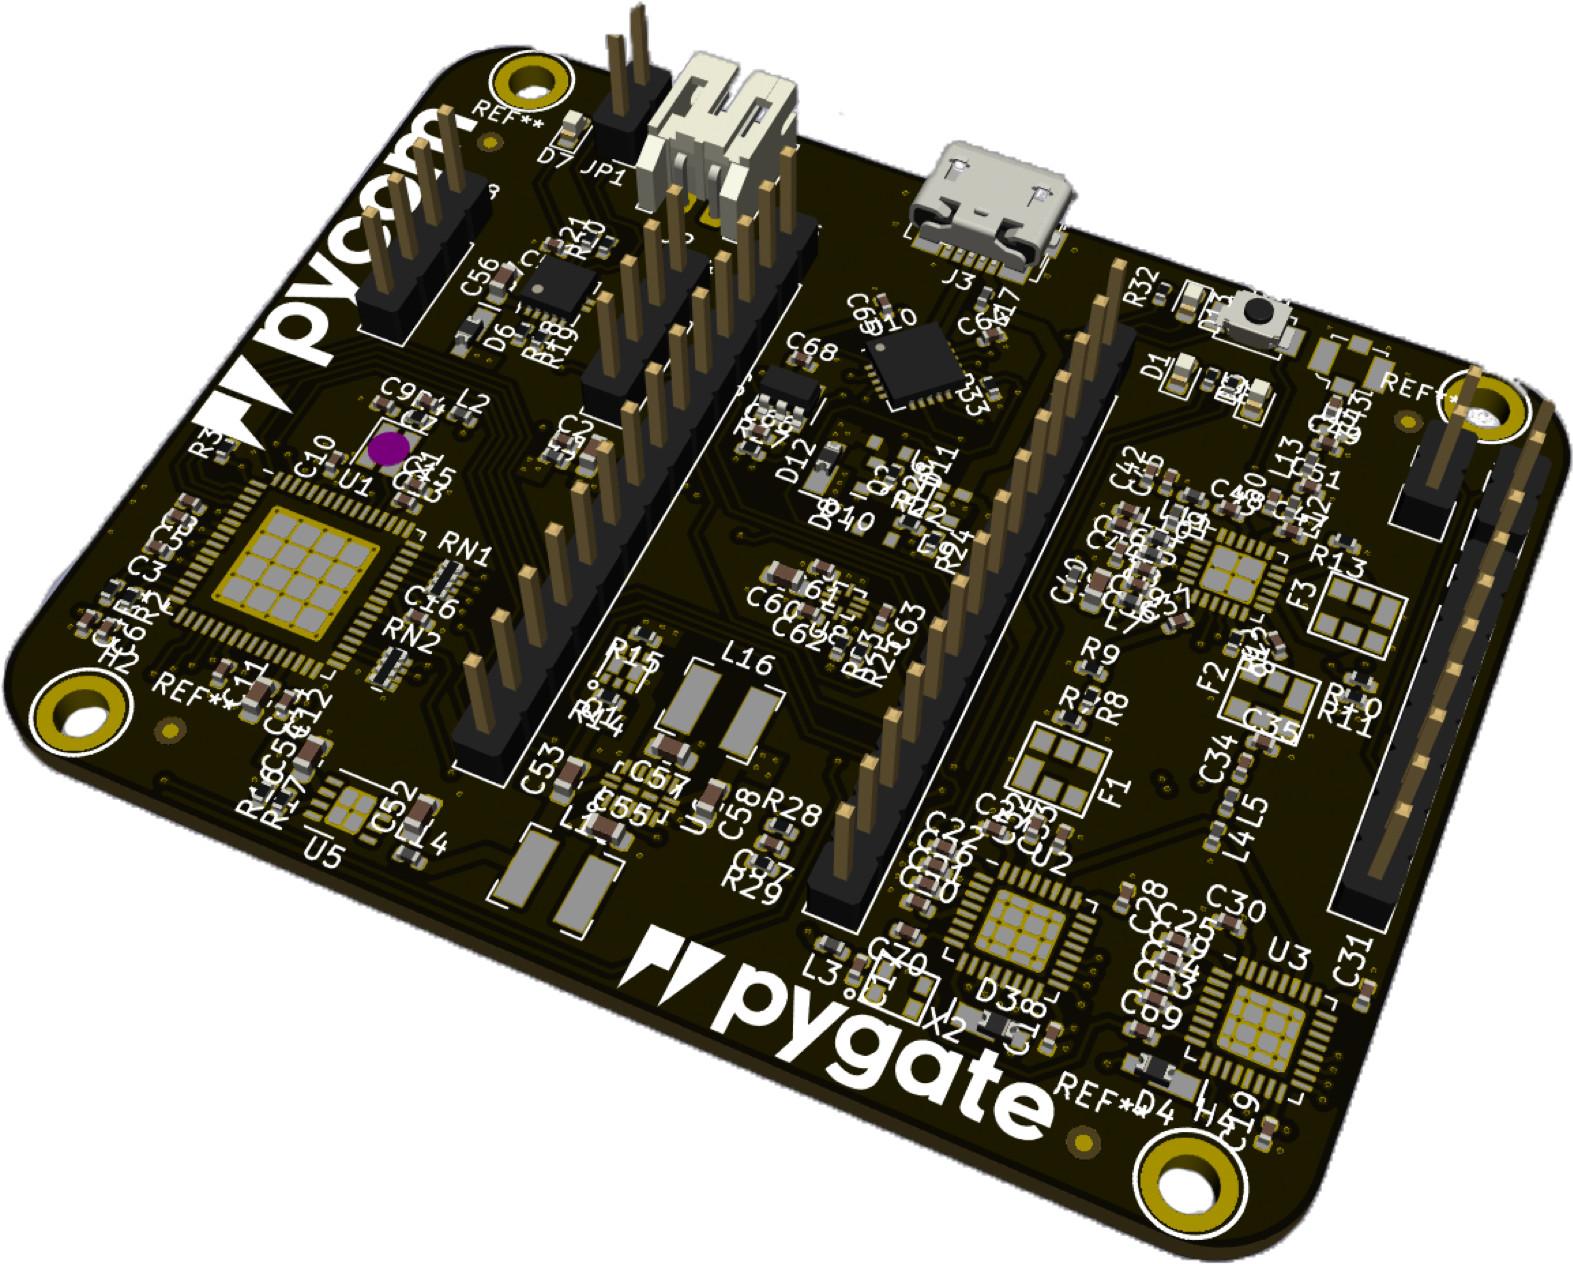 Pycom Pygate is a 50 Euros 8-channel LoRa Gateway Board